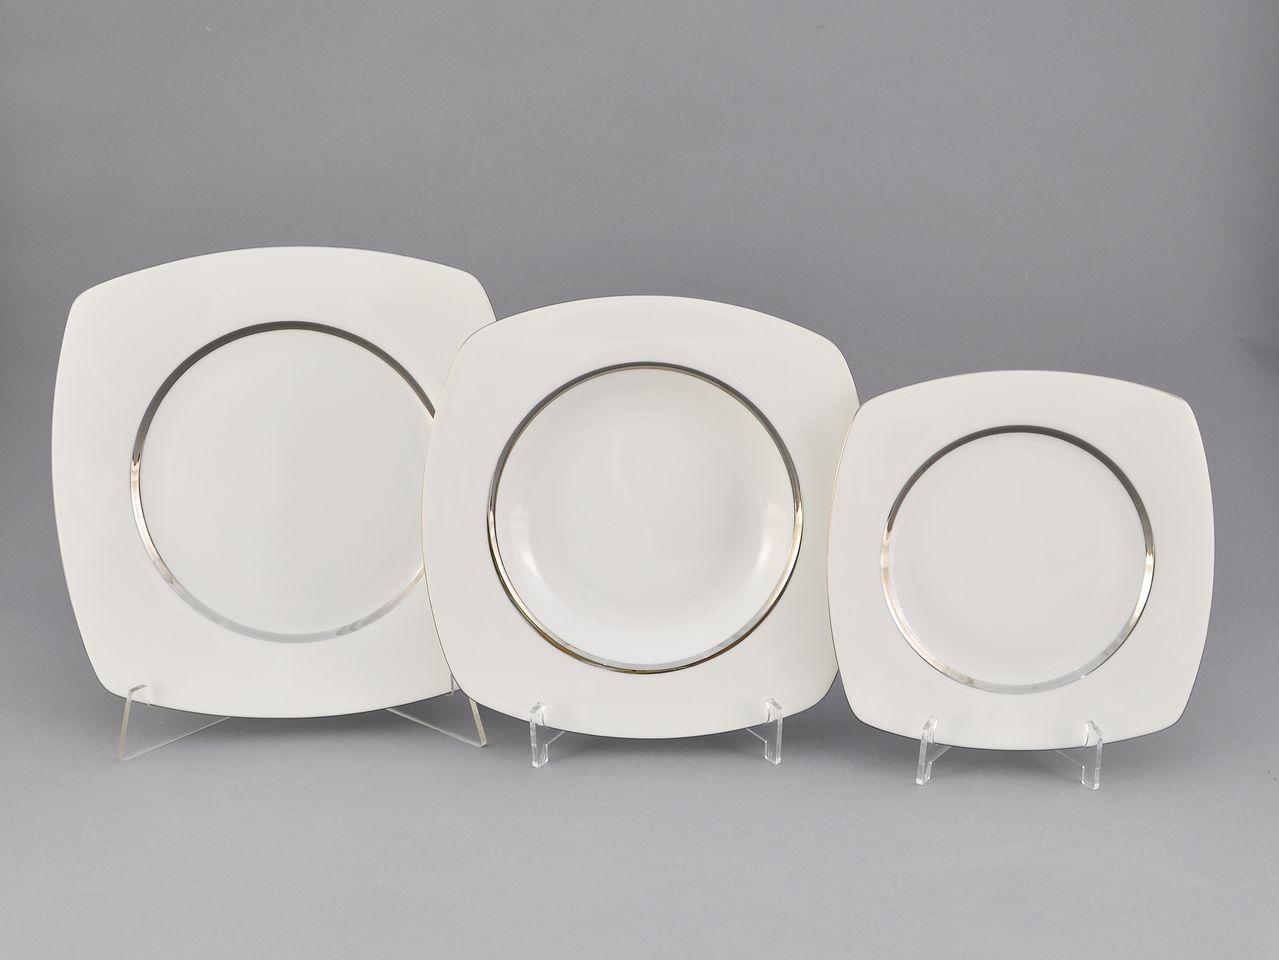 Фото Набор тарелок 18 предметов на 6 персон Форма Бьянка Айсберг